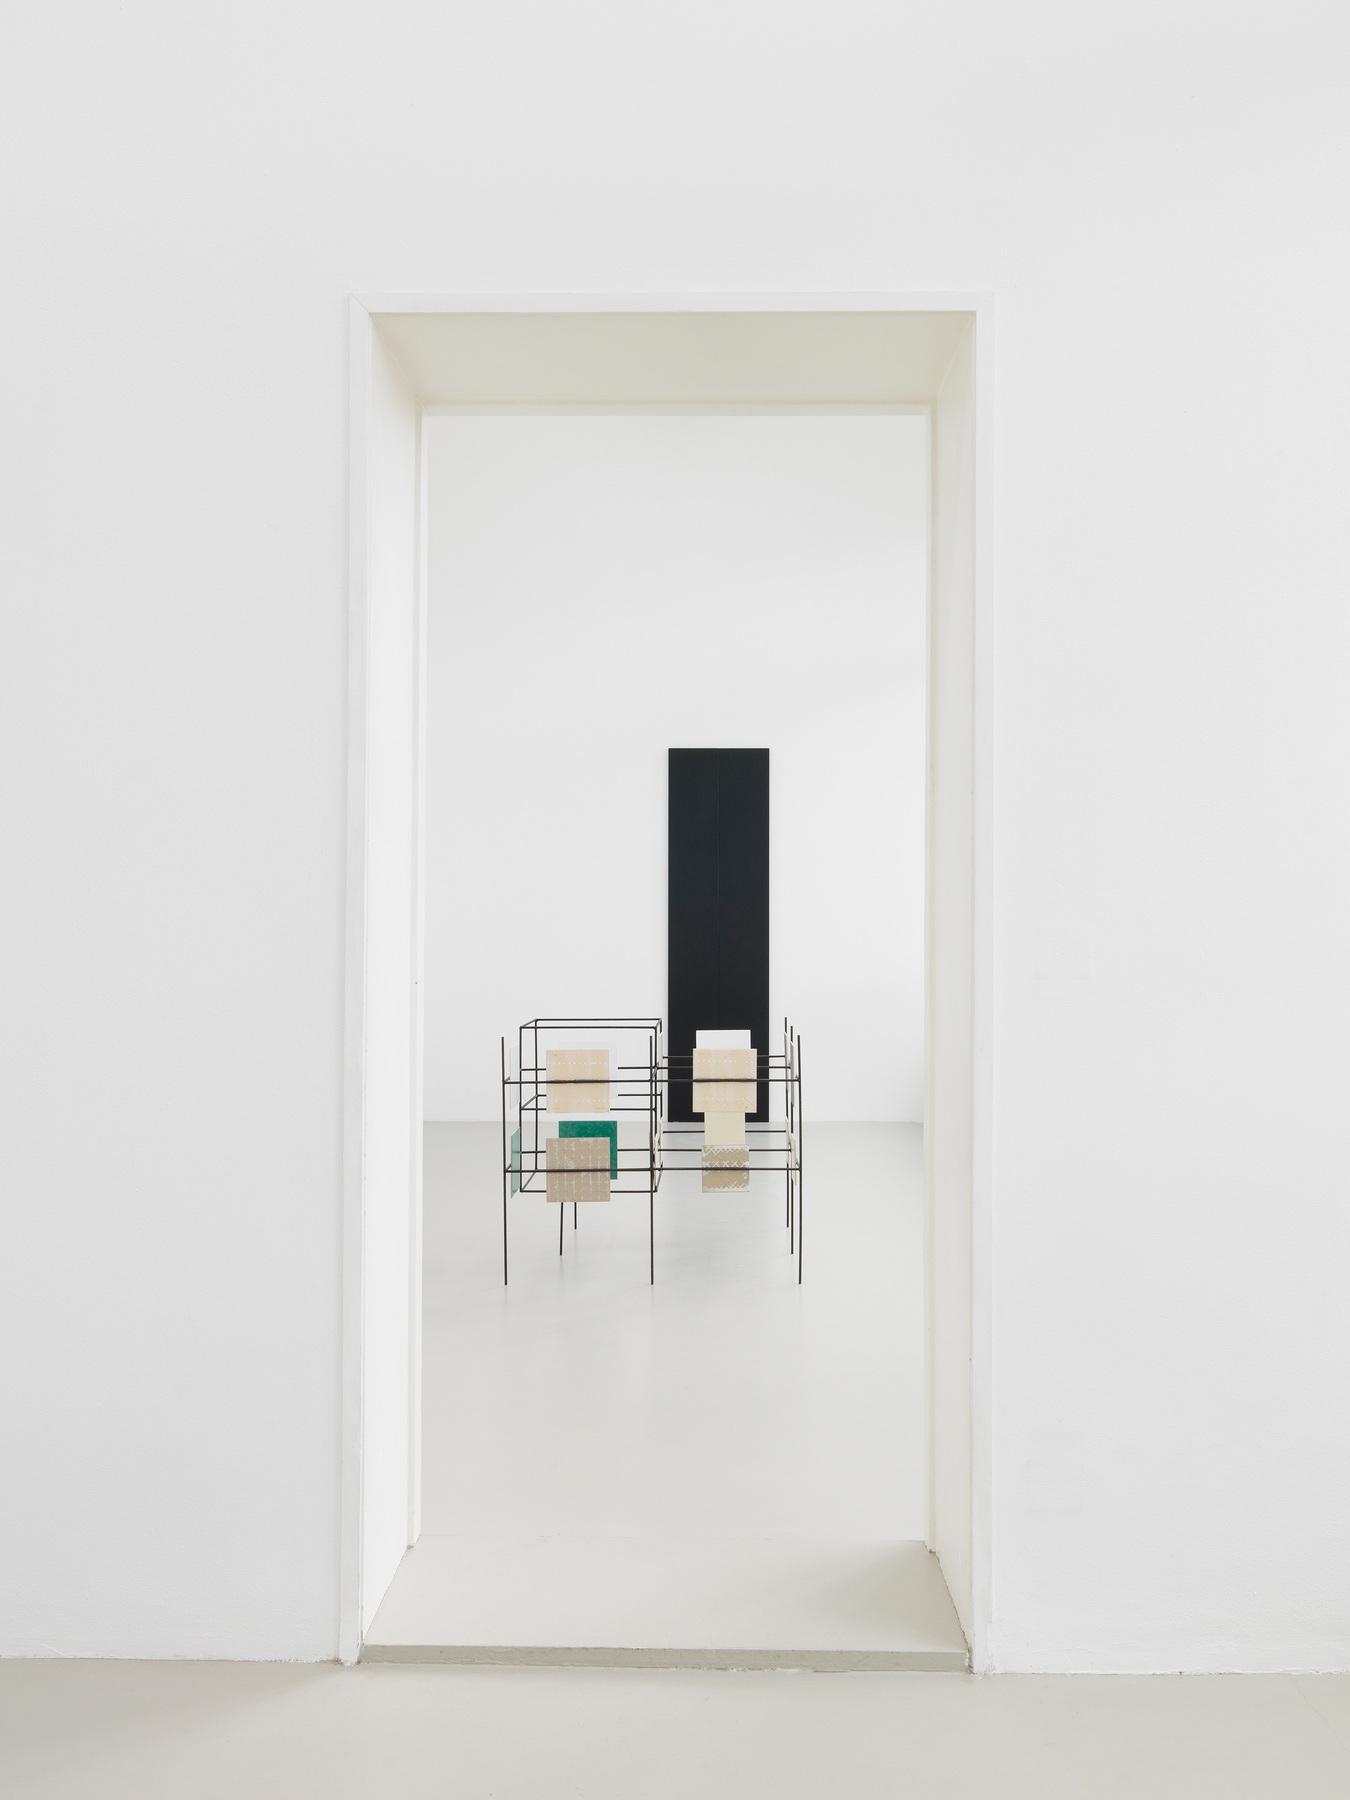 16_Edit Oderbolz_Kunstverein Nürnberg_2017